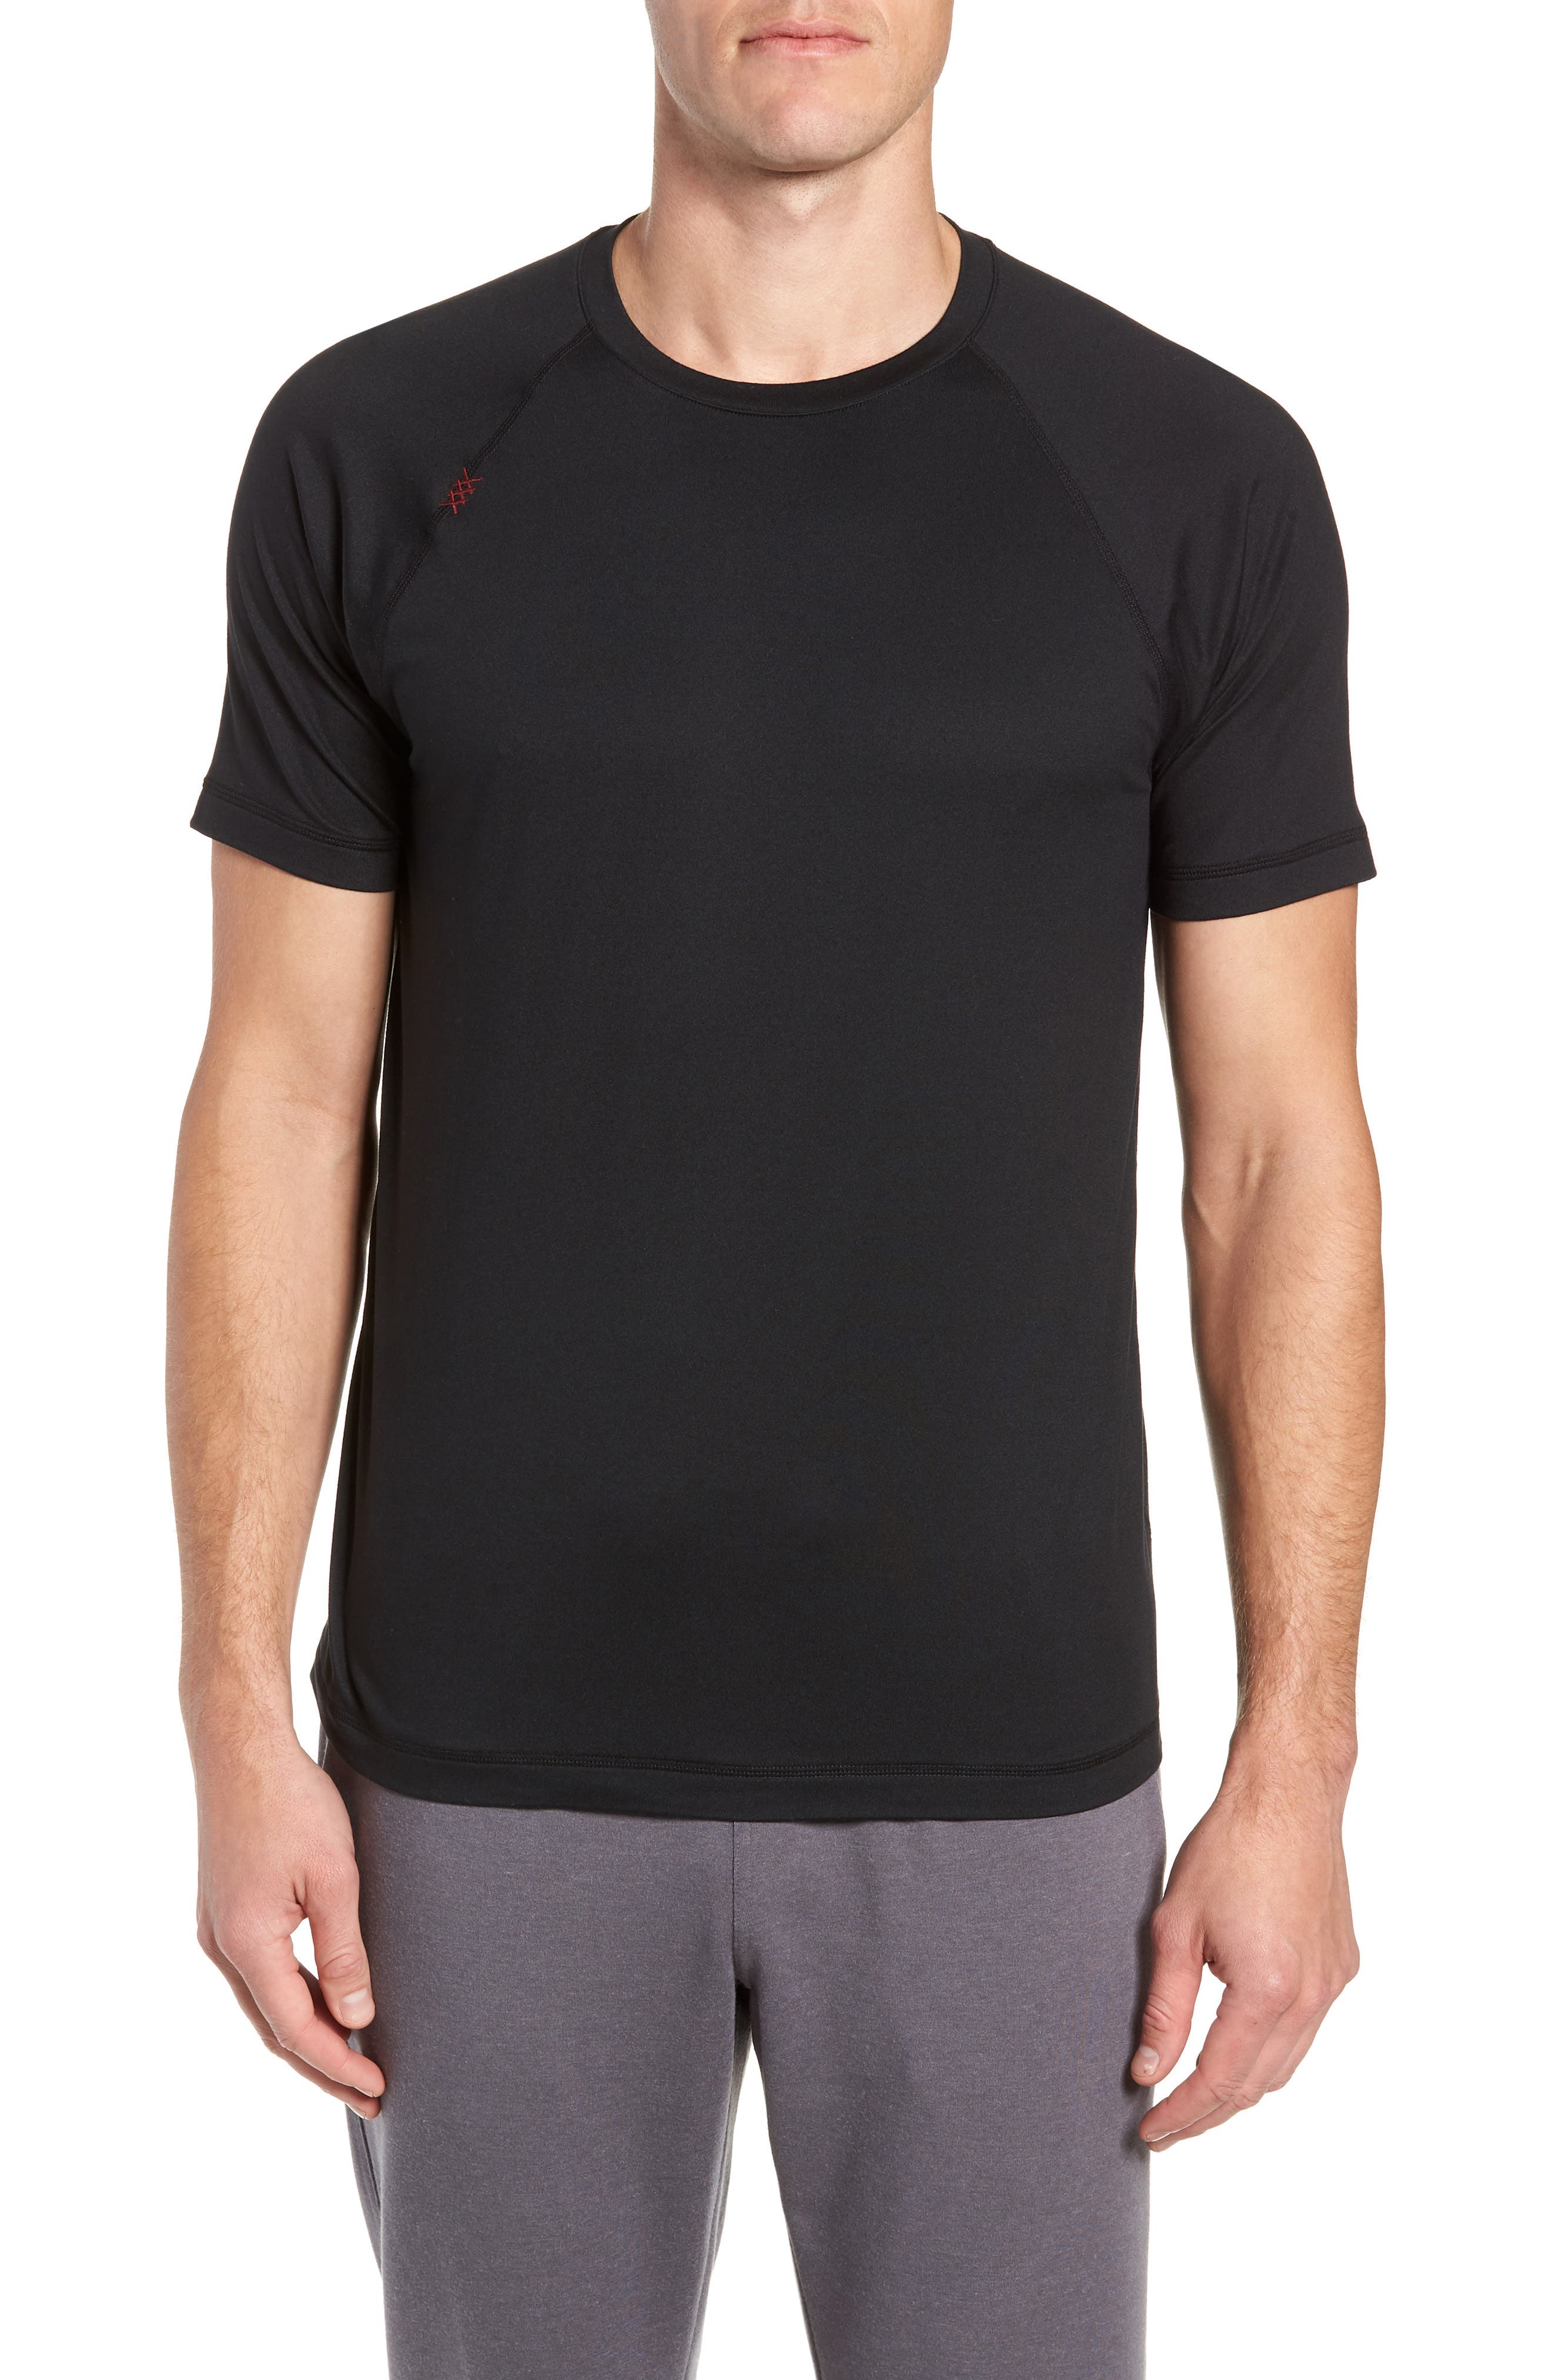 Reign Performance T-Shirt,                             Main thumbnail 1, color,                             BLACK